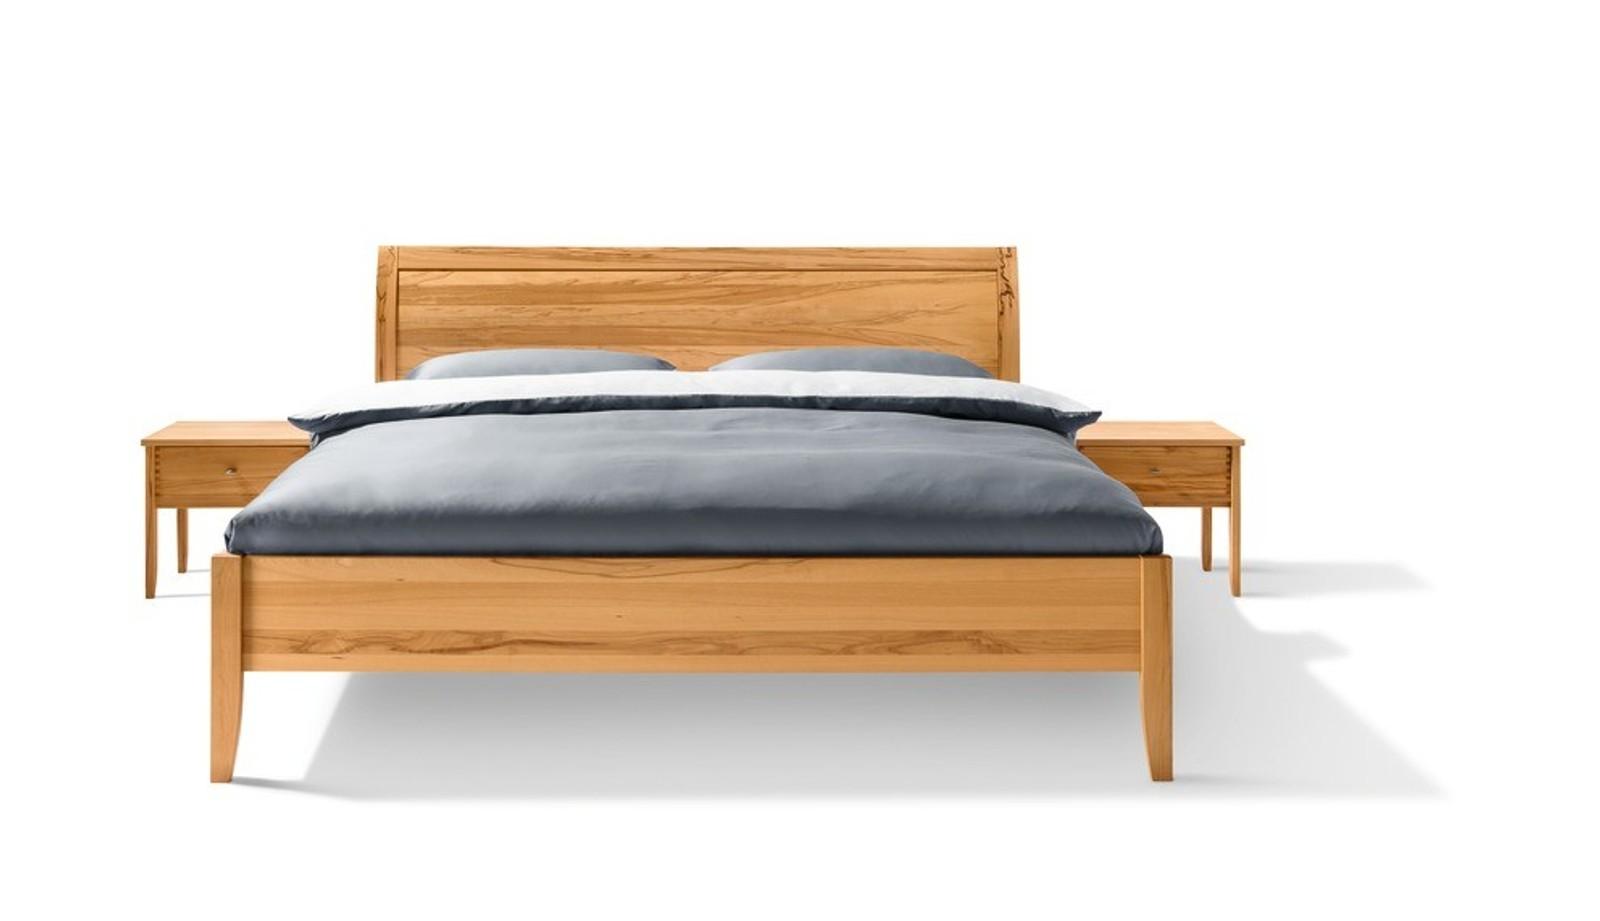 Full Size of Team 7 Betten Riletto Preise Abverkauf Kaufen Gebraucht Bett Modell Sesam Werkshagen Teenager Test Musterring Günstige Tempur Japanische Holz Nolte Ebay Bett Team 7 Betten